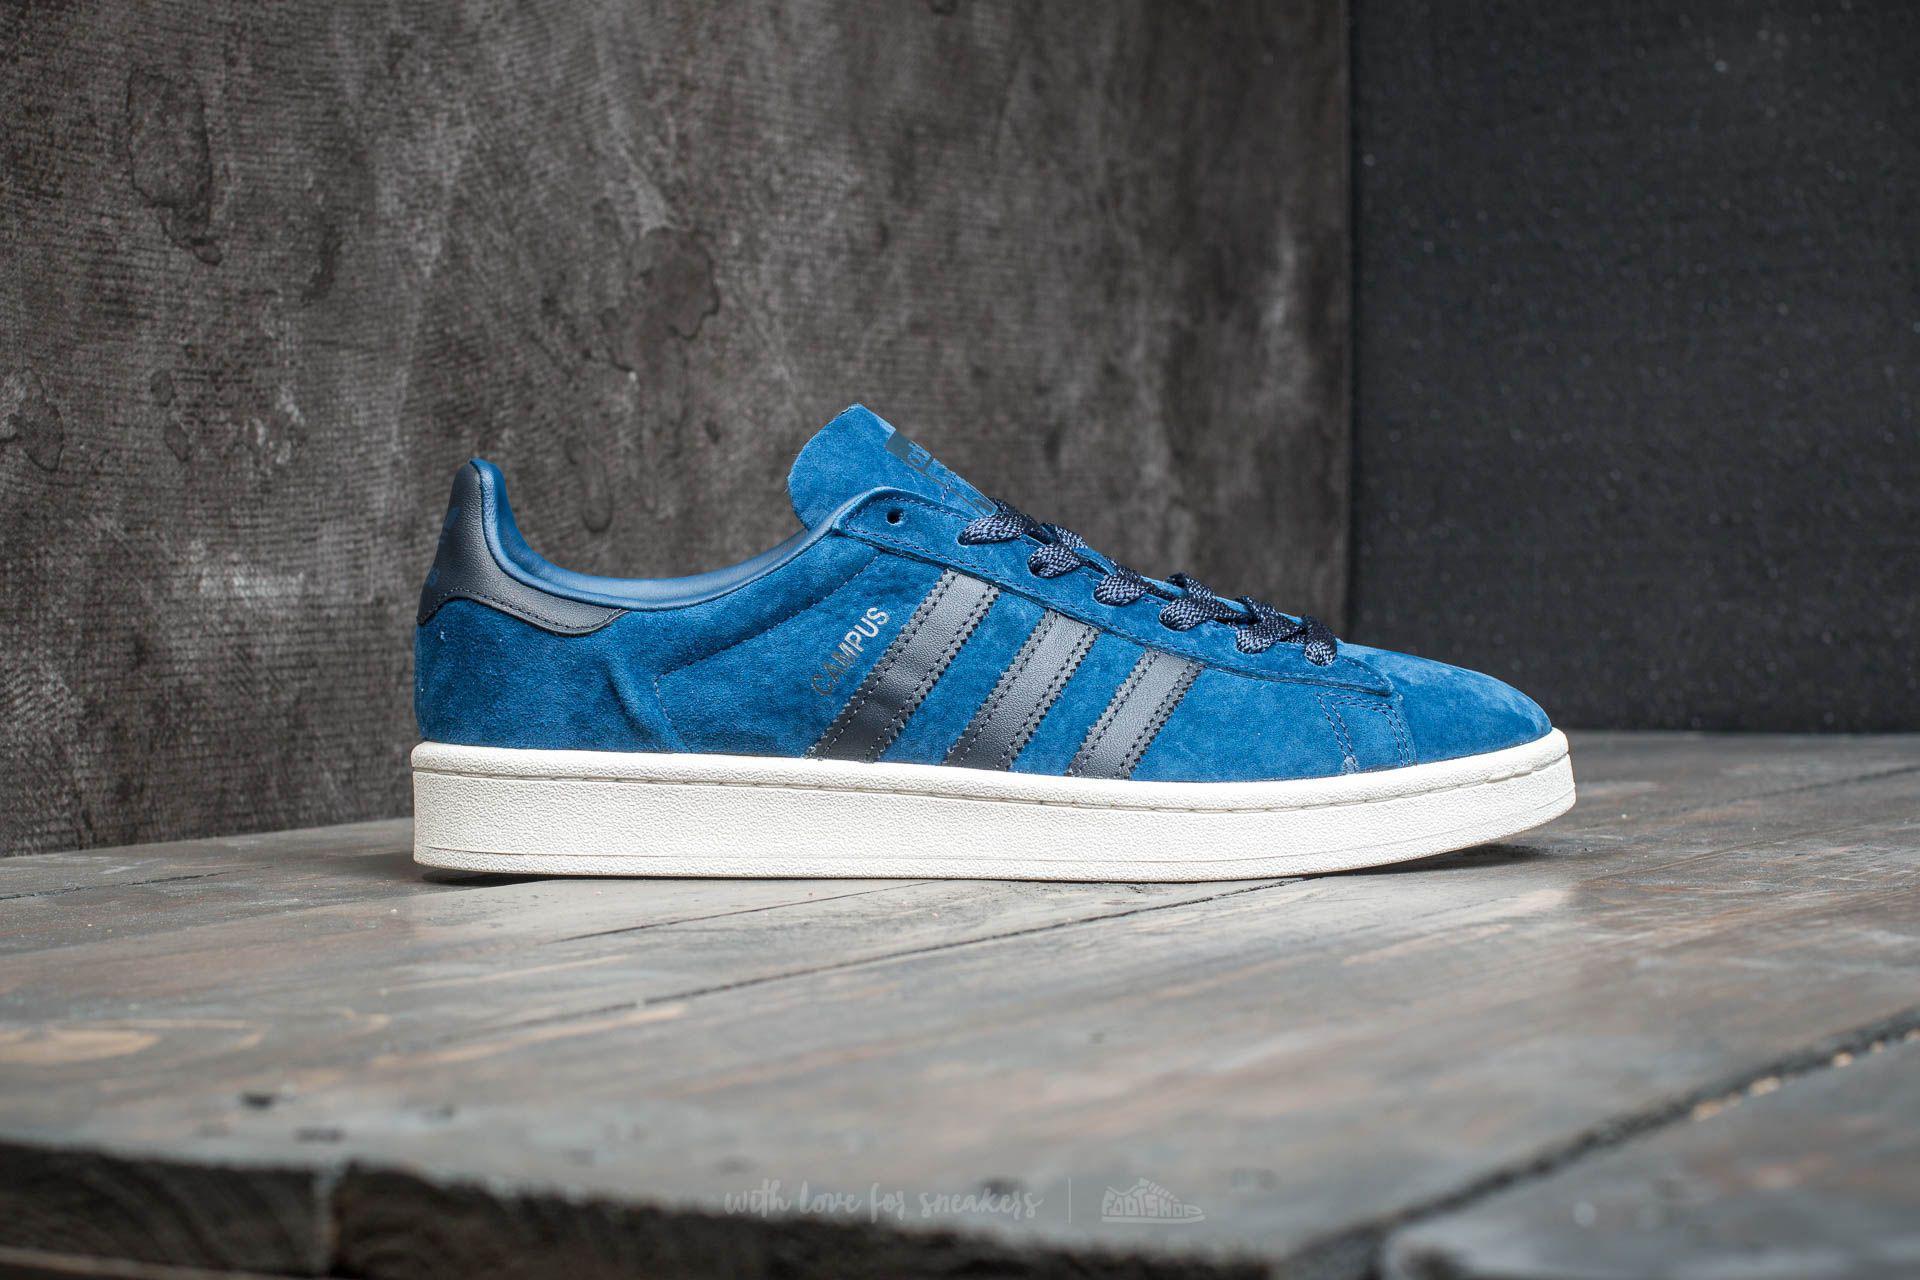 separation shoes 5100b 14680 Lyst - adidas Originals Adidas Campus Mystery Blue Night Nav